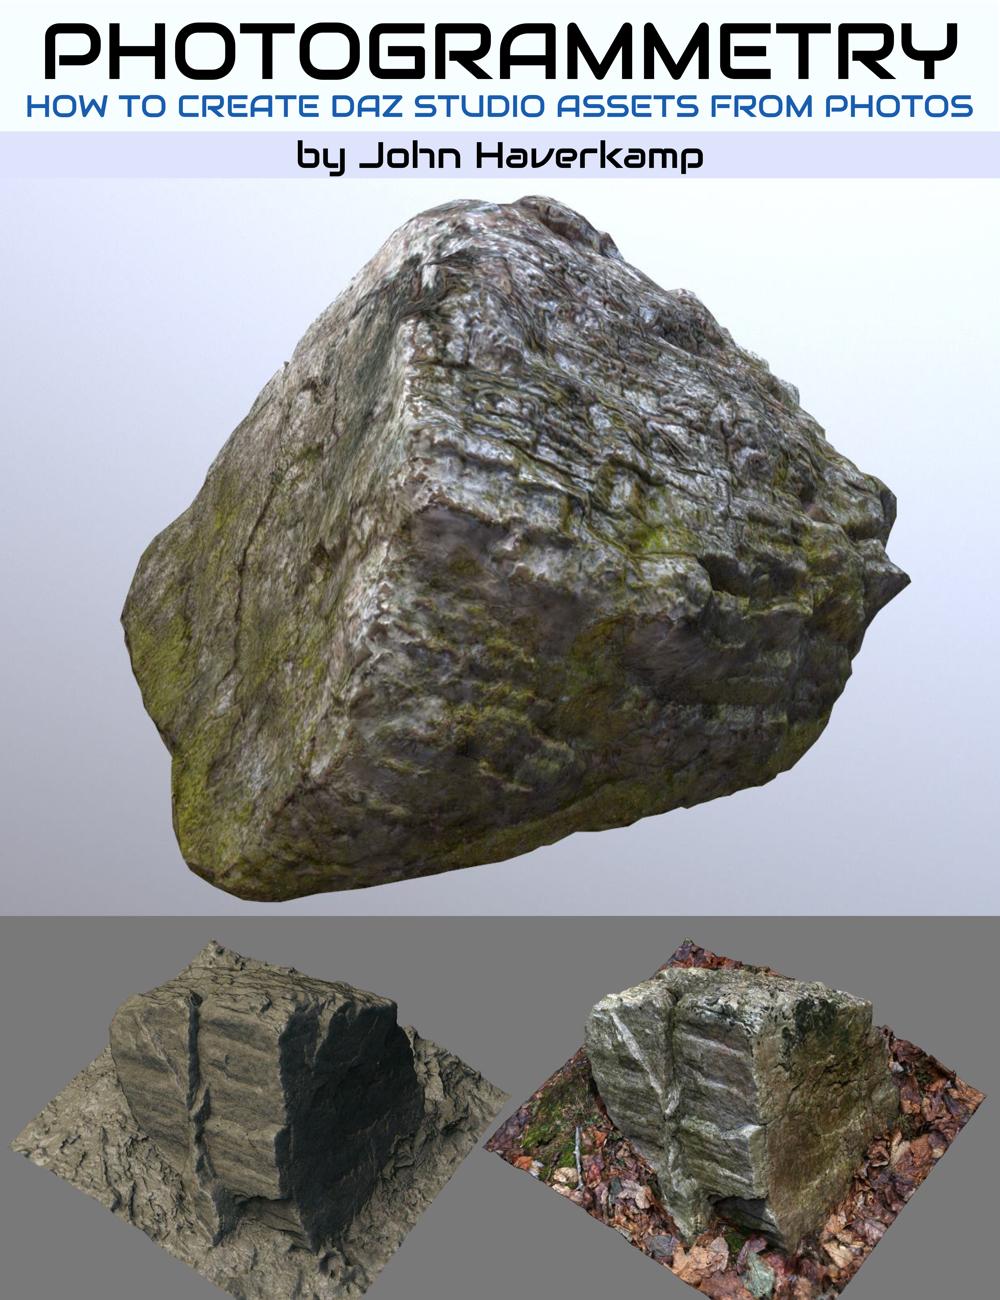 Photogrammetry : Creating Daz Studio Assets from Photos by: Digital Art Livemagbhitu, 3D Models by Daz 3D